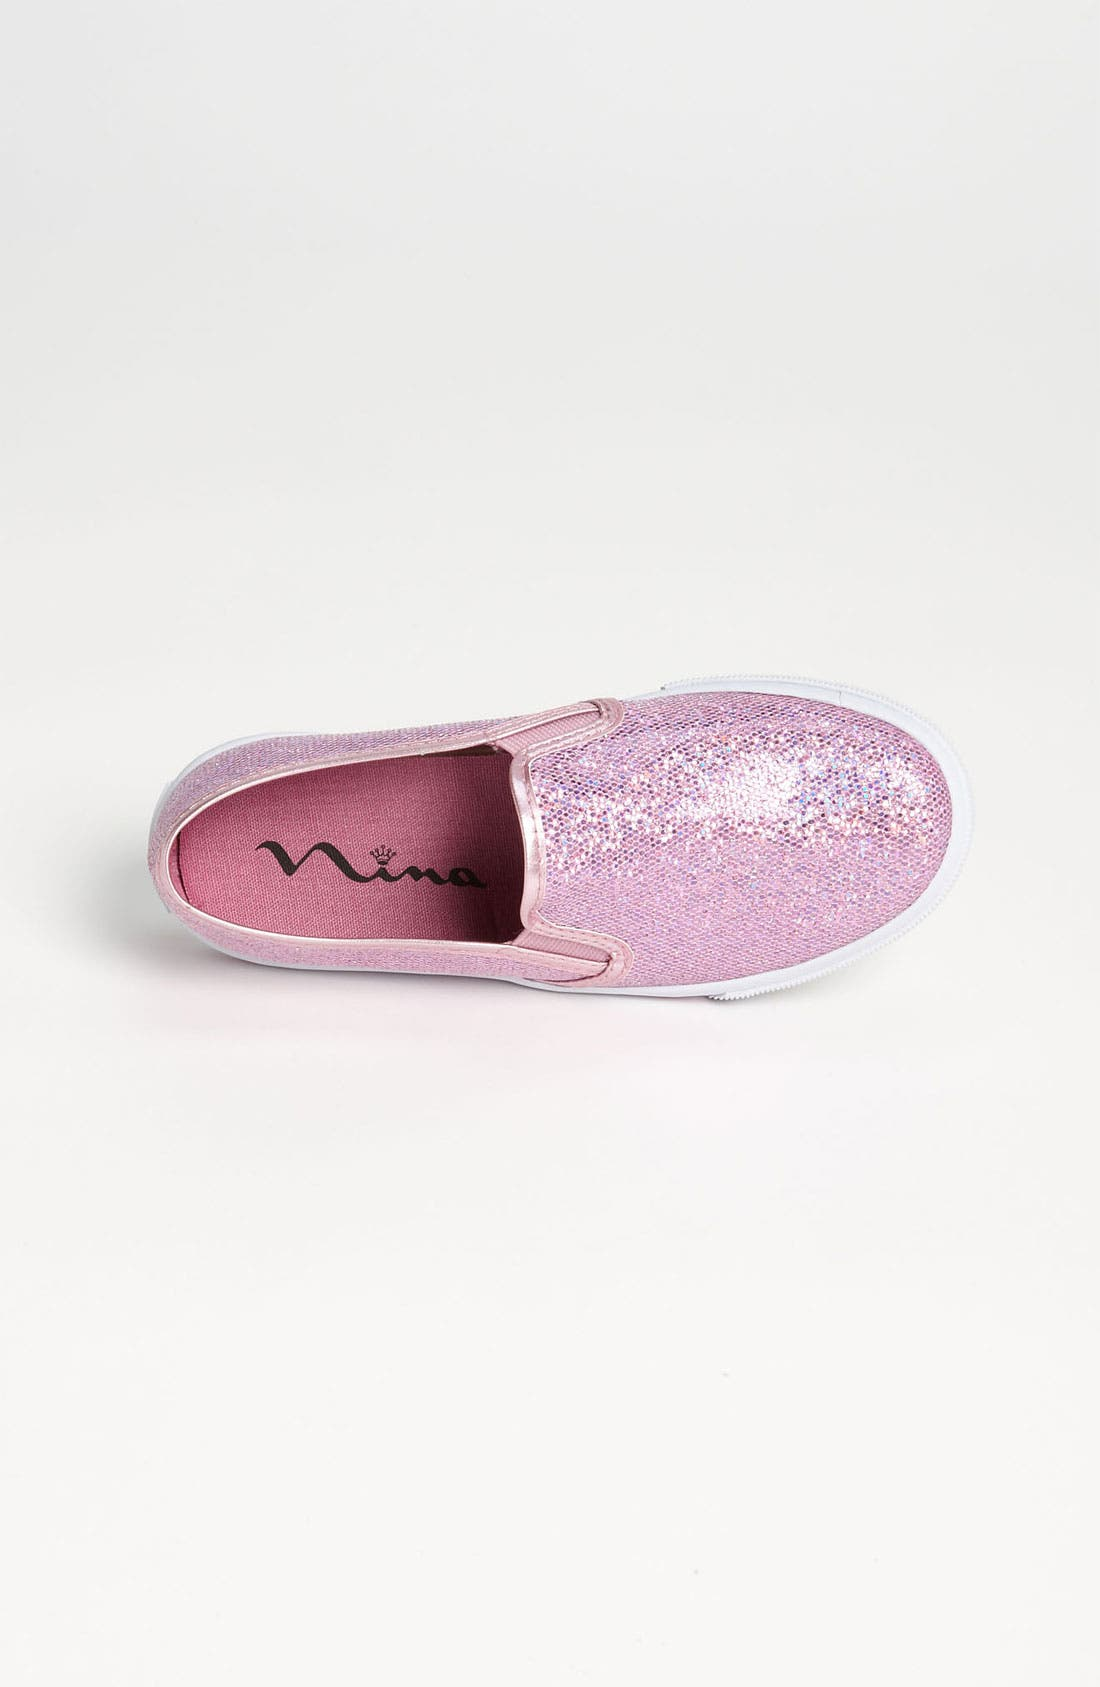 Alternate Image 3  - Nina 'Havanie' Slip-On Sneaker (Toddler, Little Kid & Big Kid)